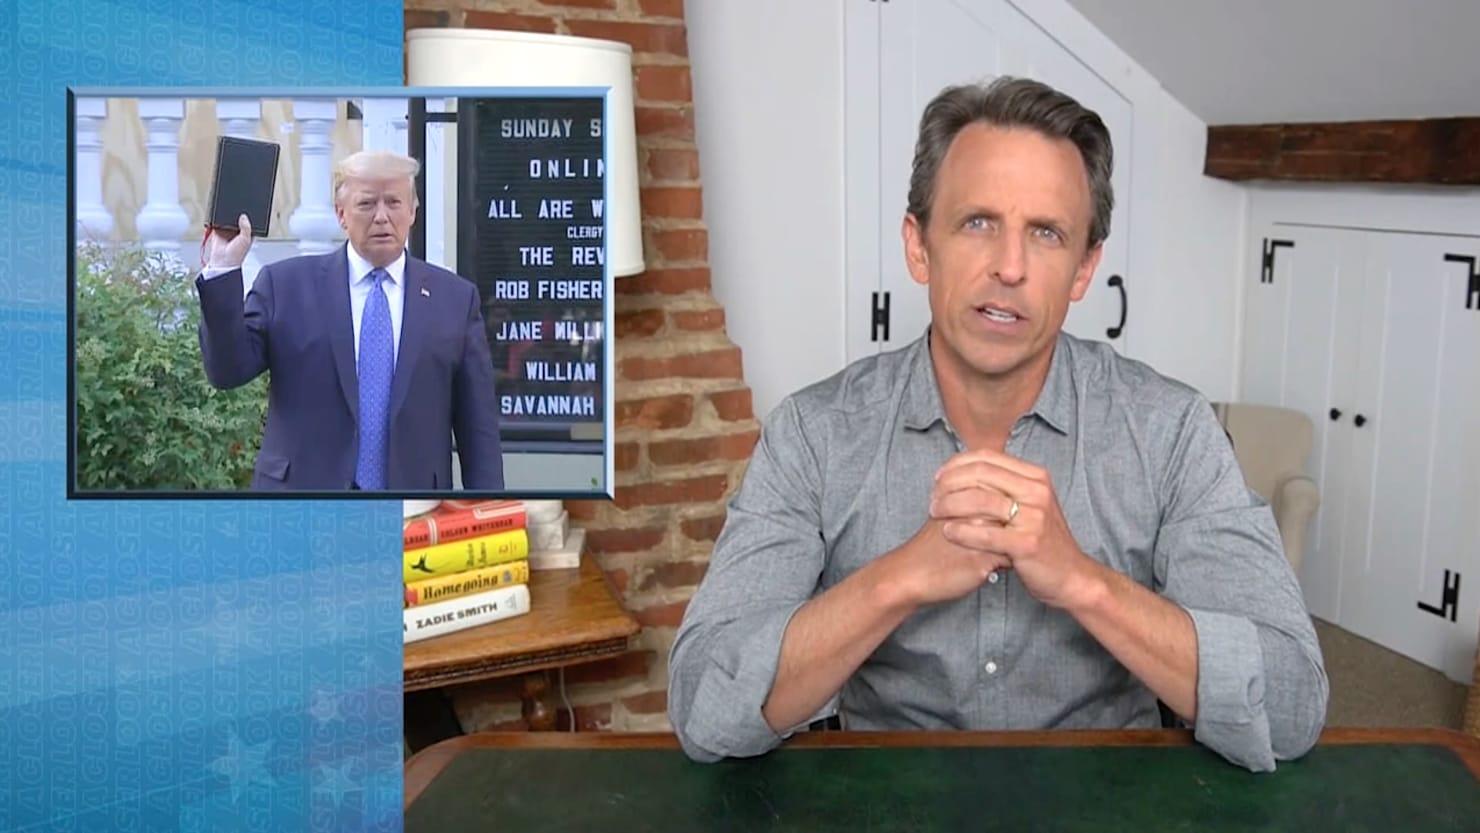 Seth Meyers Tears Apart Trump's 'Horrifying' Bible Photo-Op